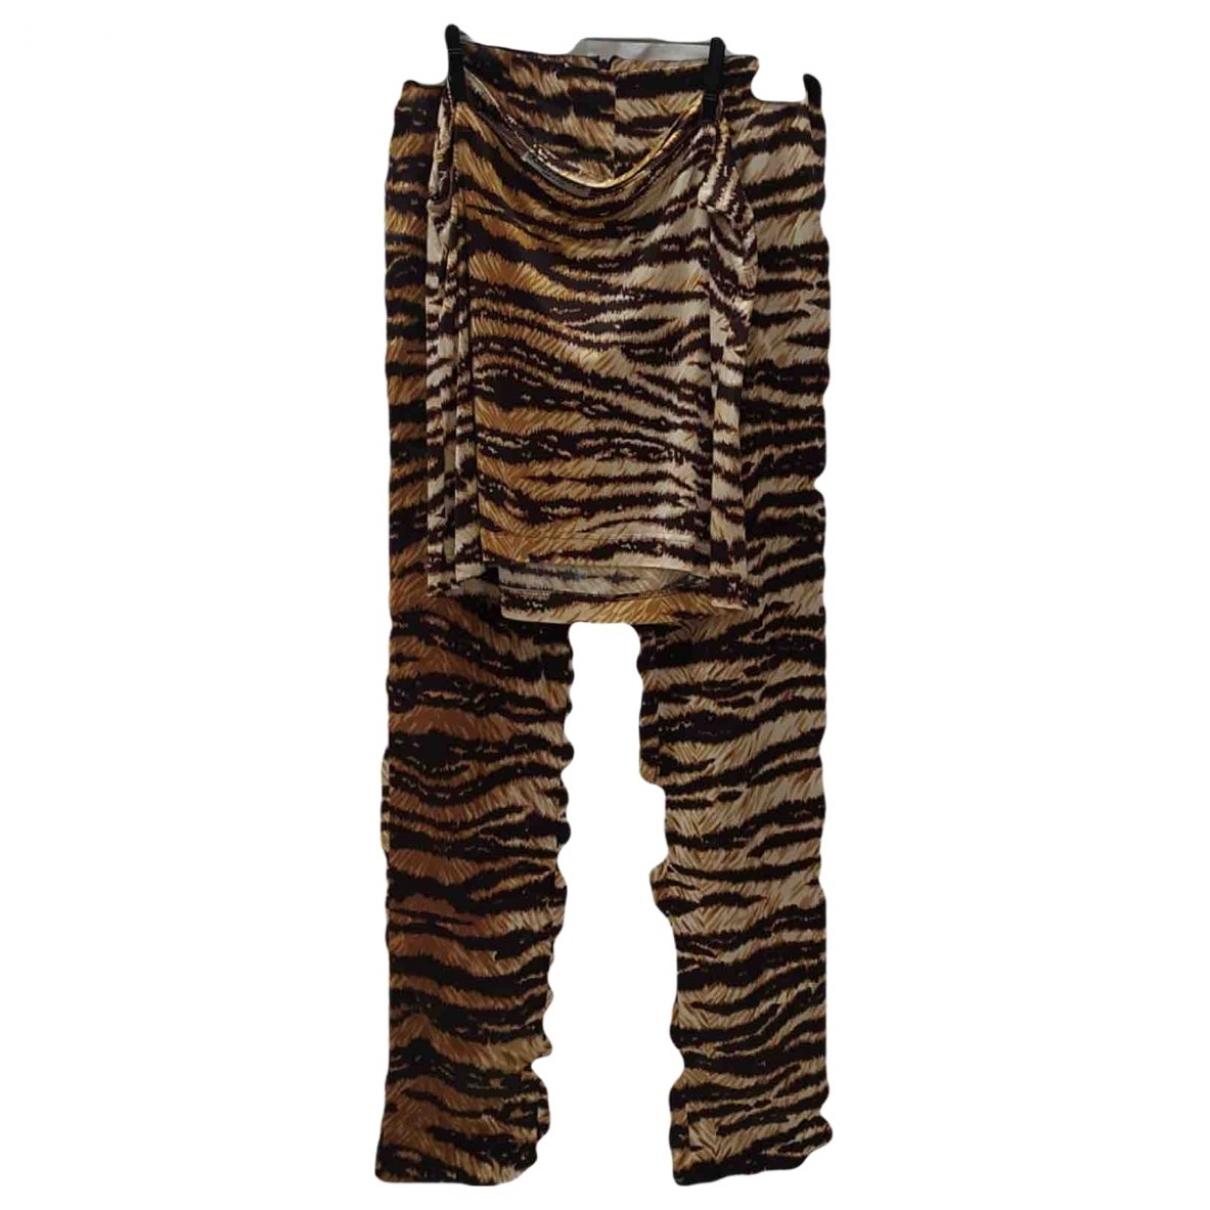 Dolce & Gabbana \N Brown jumpsuit for Women S International